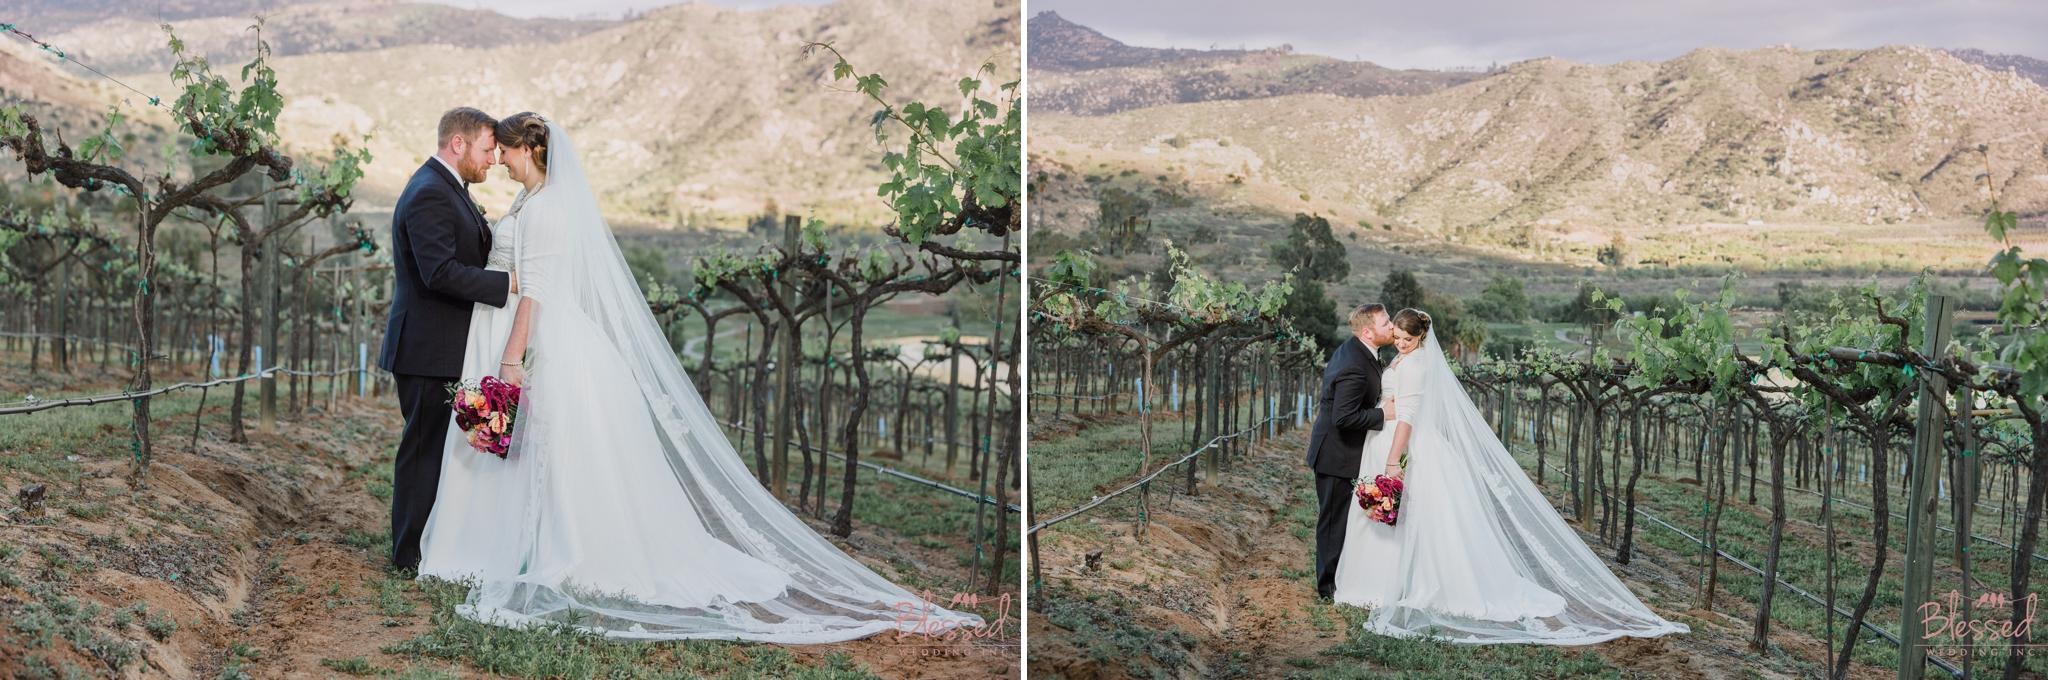 Orfila Vinery Wedding Temecula Wedding Photographer 28.jpg